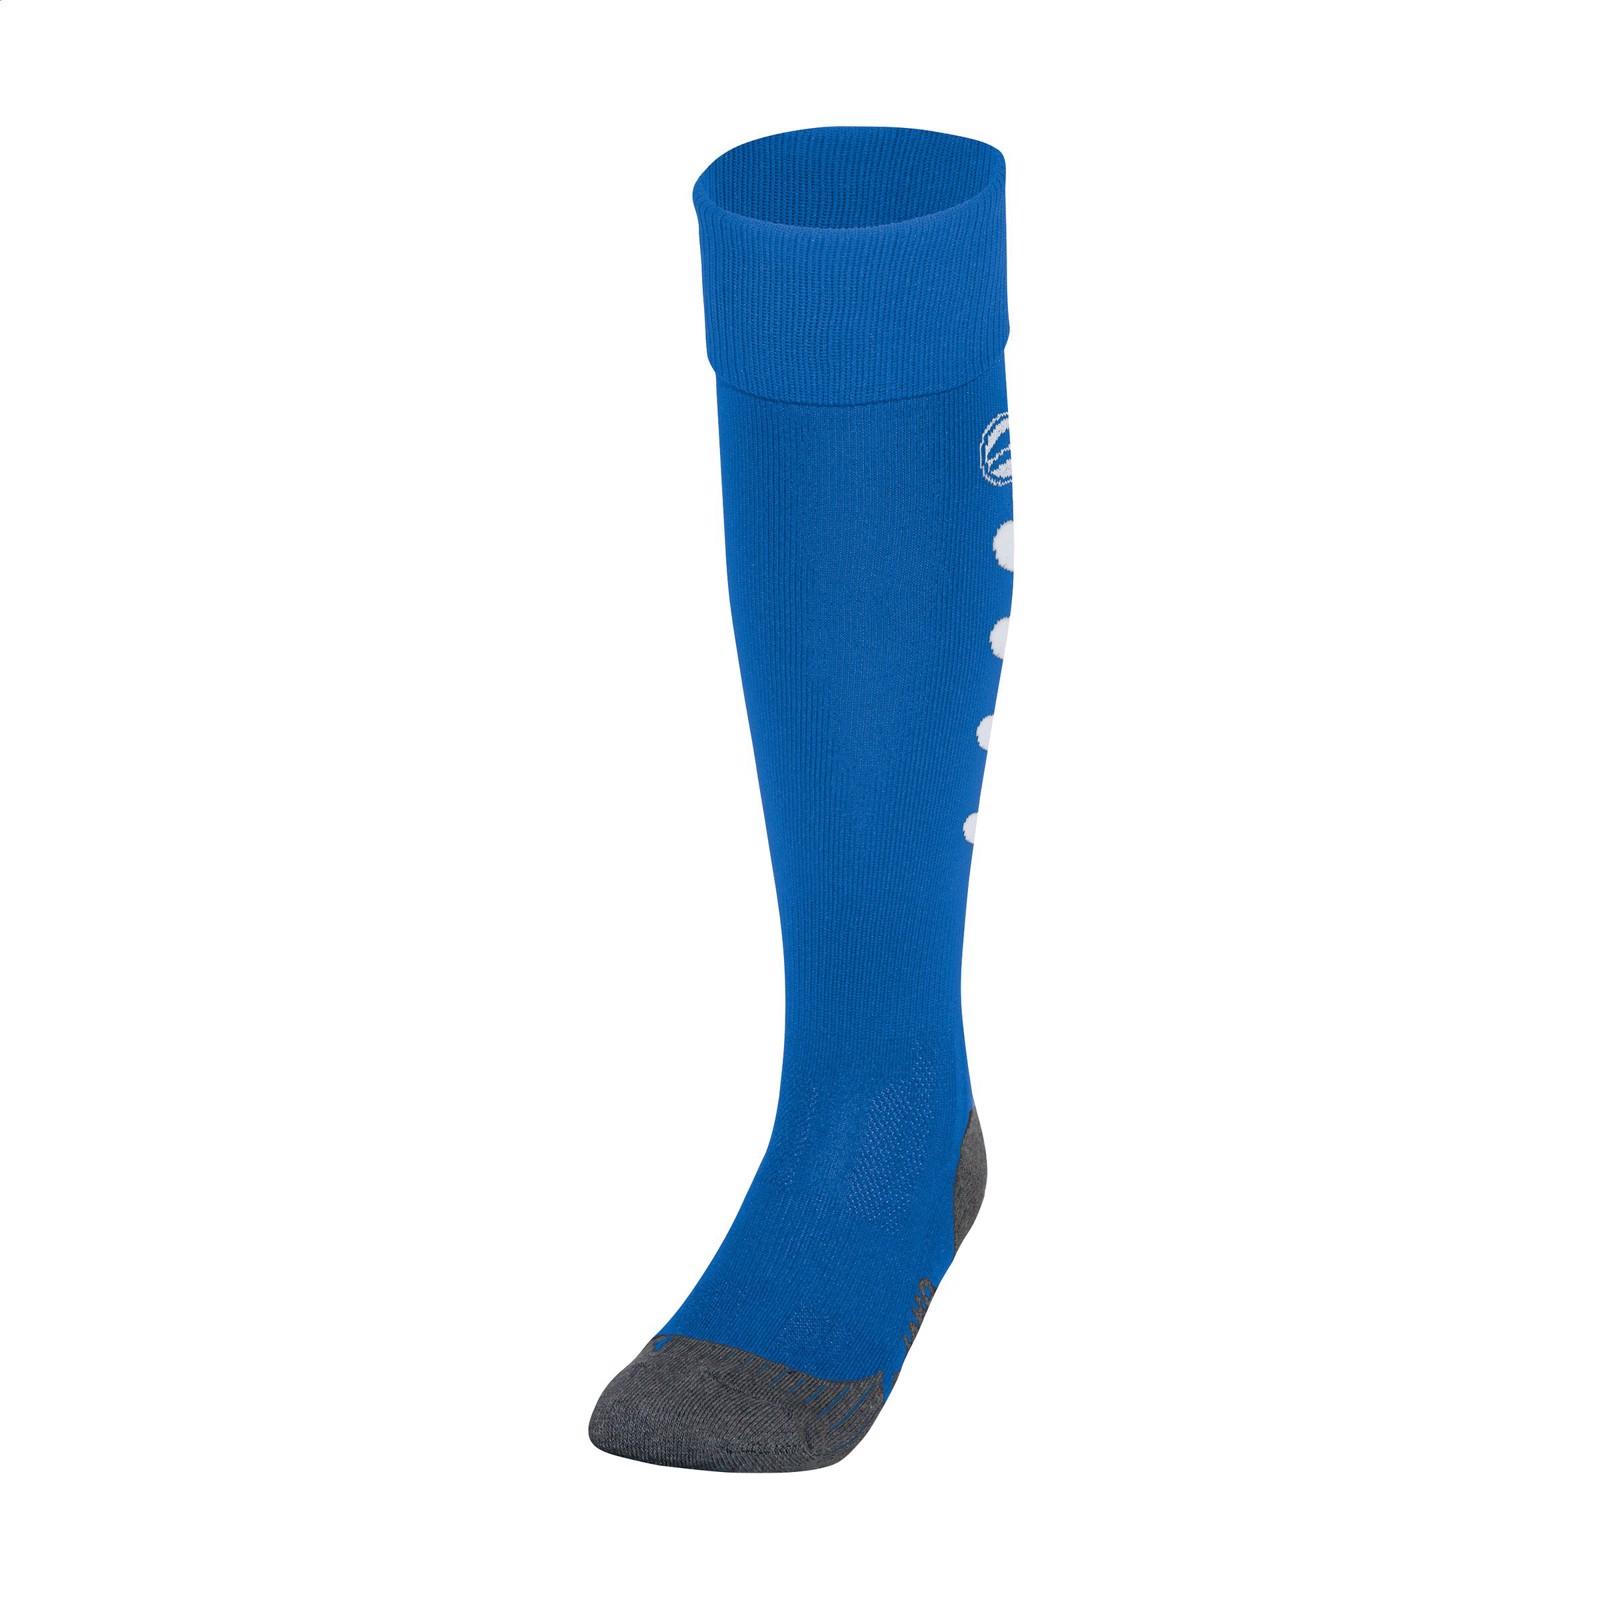 Jako® Roma Sport Socks - Cobalt Blue / S